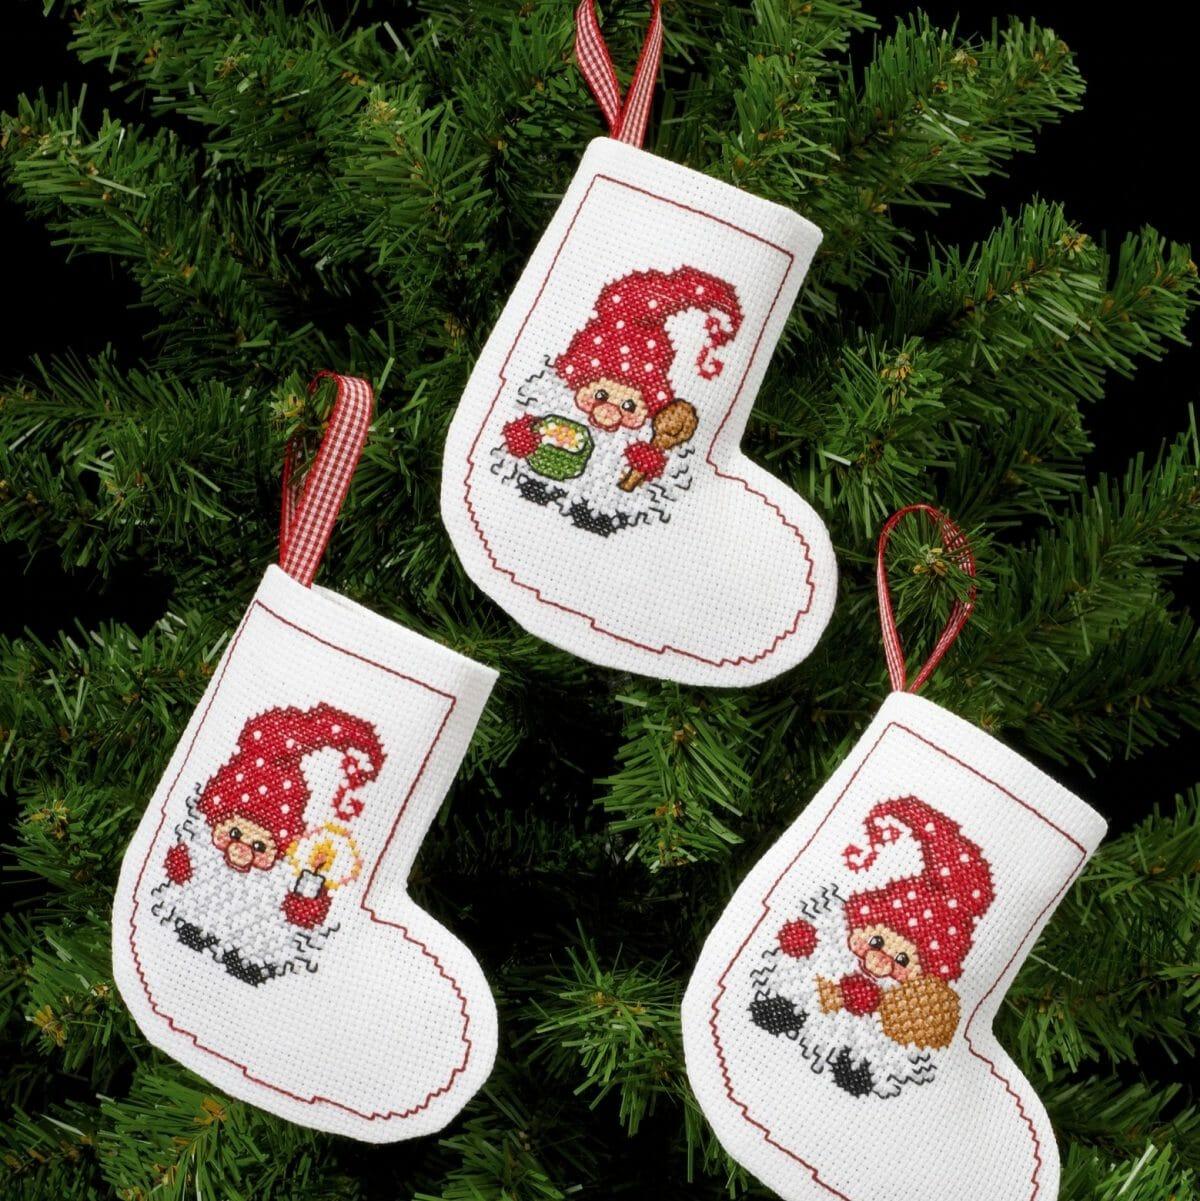 mini nissestrømpe, 3 nisser, permin, julestrømpe, nisser med prikkete lue, juletrepynt, juletre, julepynt, 7240-21